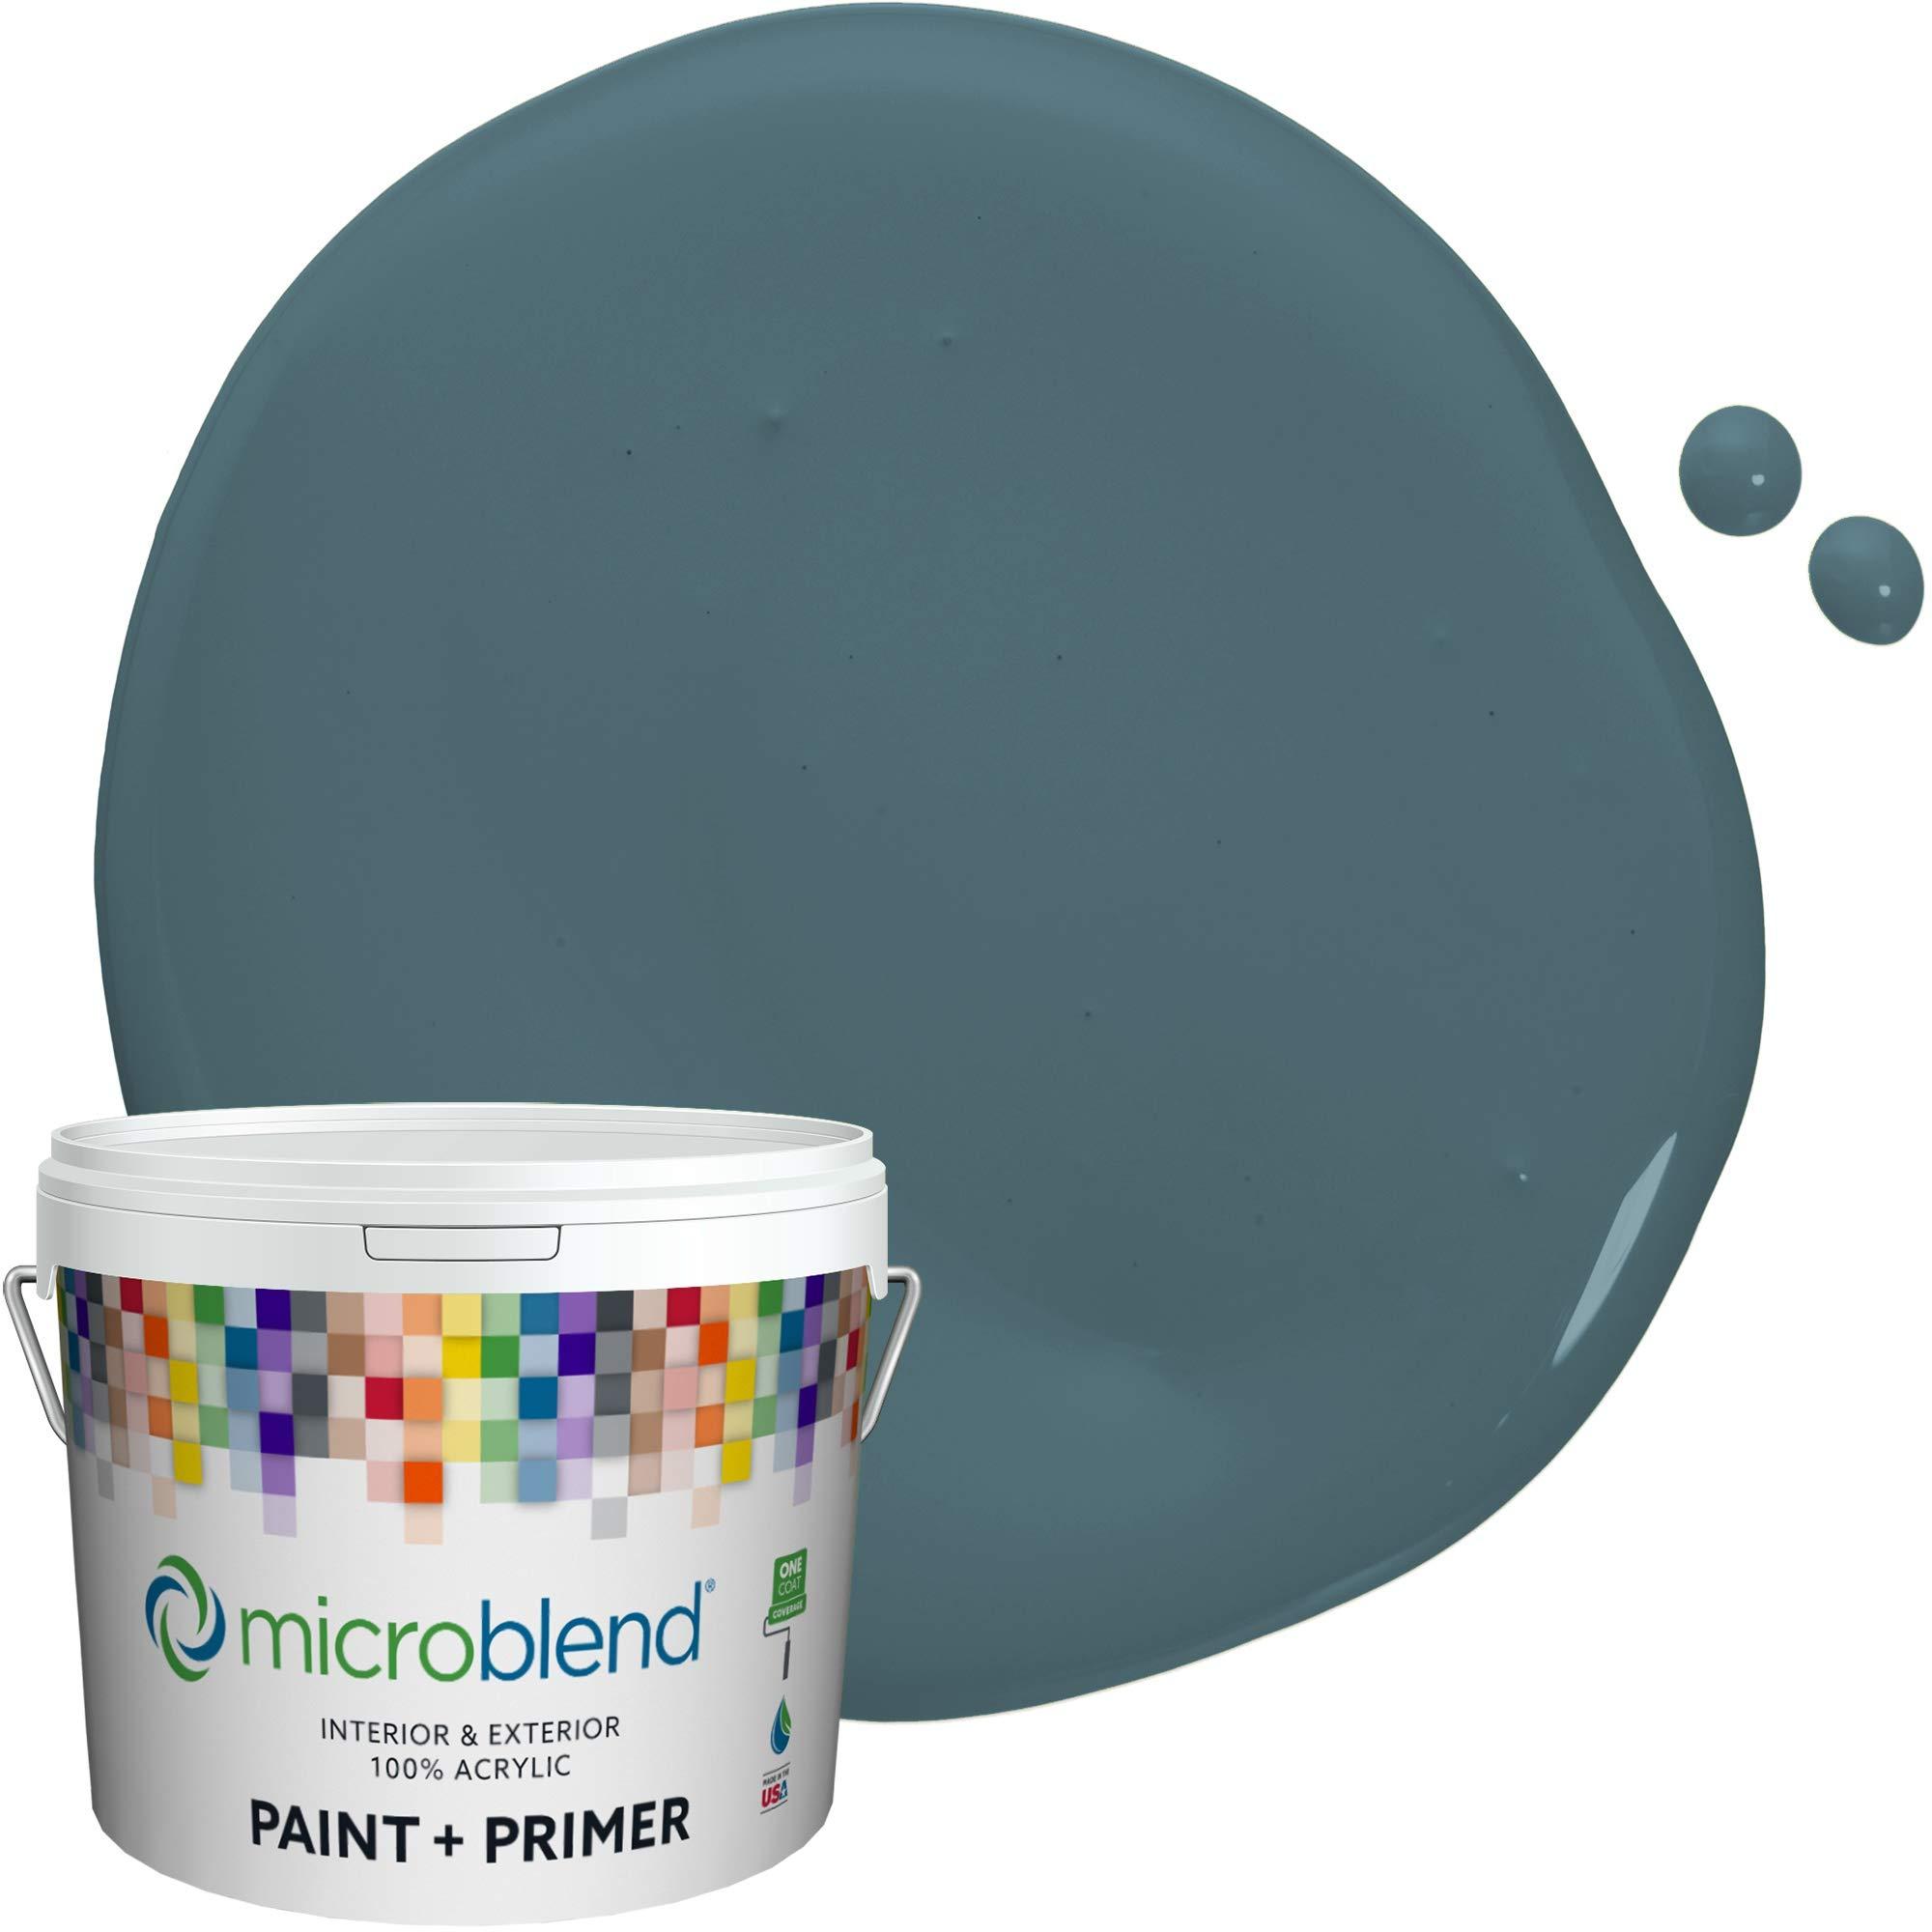 MicroBlend Interior Paint + Primer, Bridgeview, Eggshell Sheen, 1 Gallon, Custom Made, Premium Quality One Coat Hide & Washable Paint (73223-2-M0355B5)